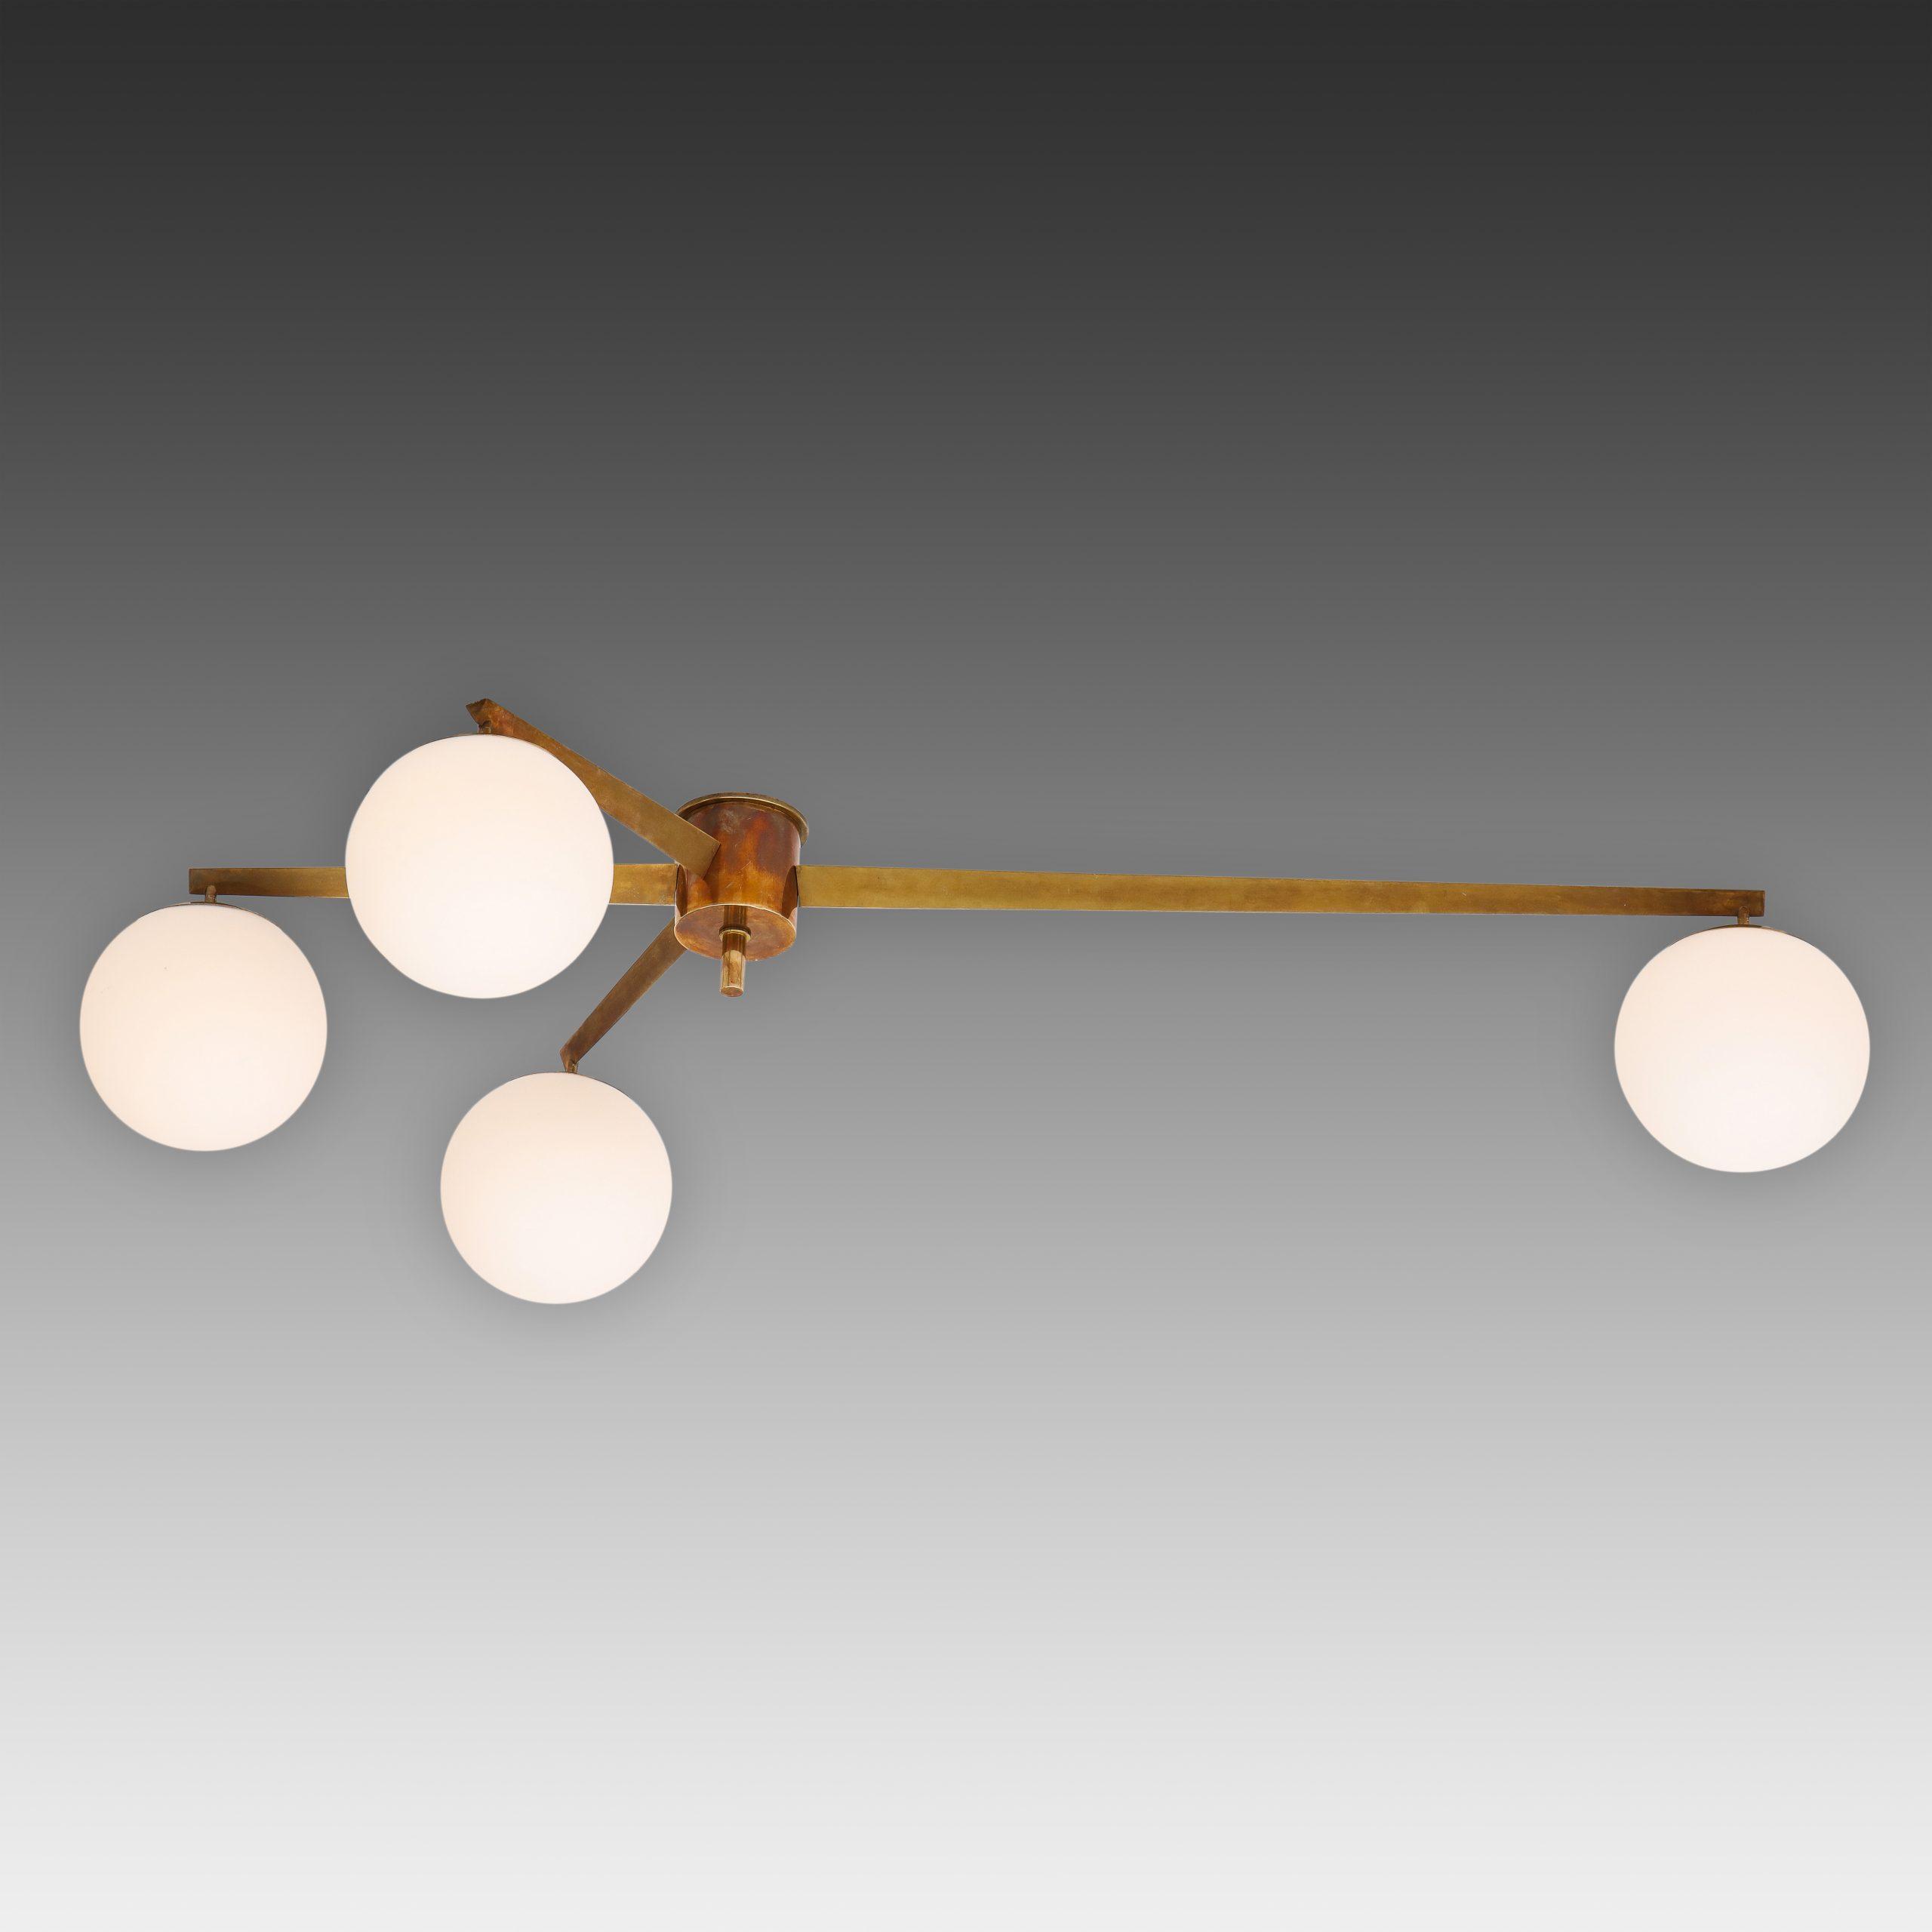 Stella Ceiling Light or Chandelier by Angelo Lelii for Arredoluce | soyun k.